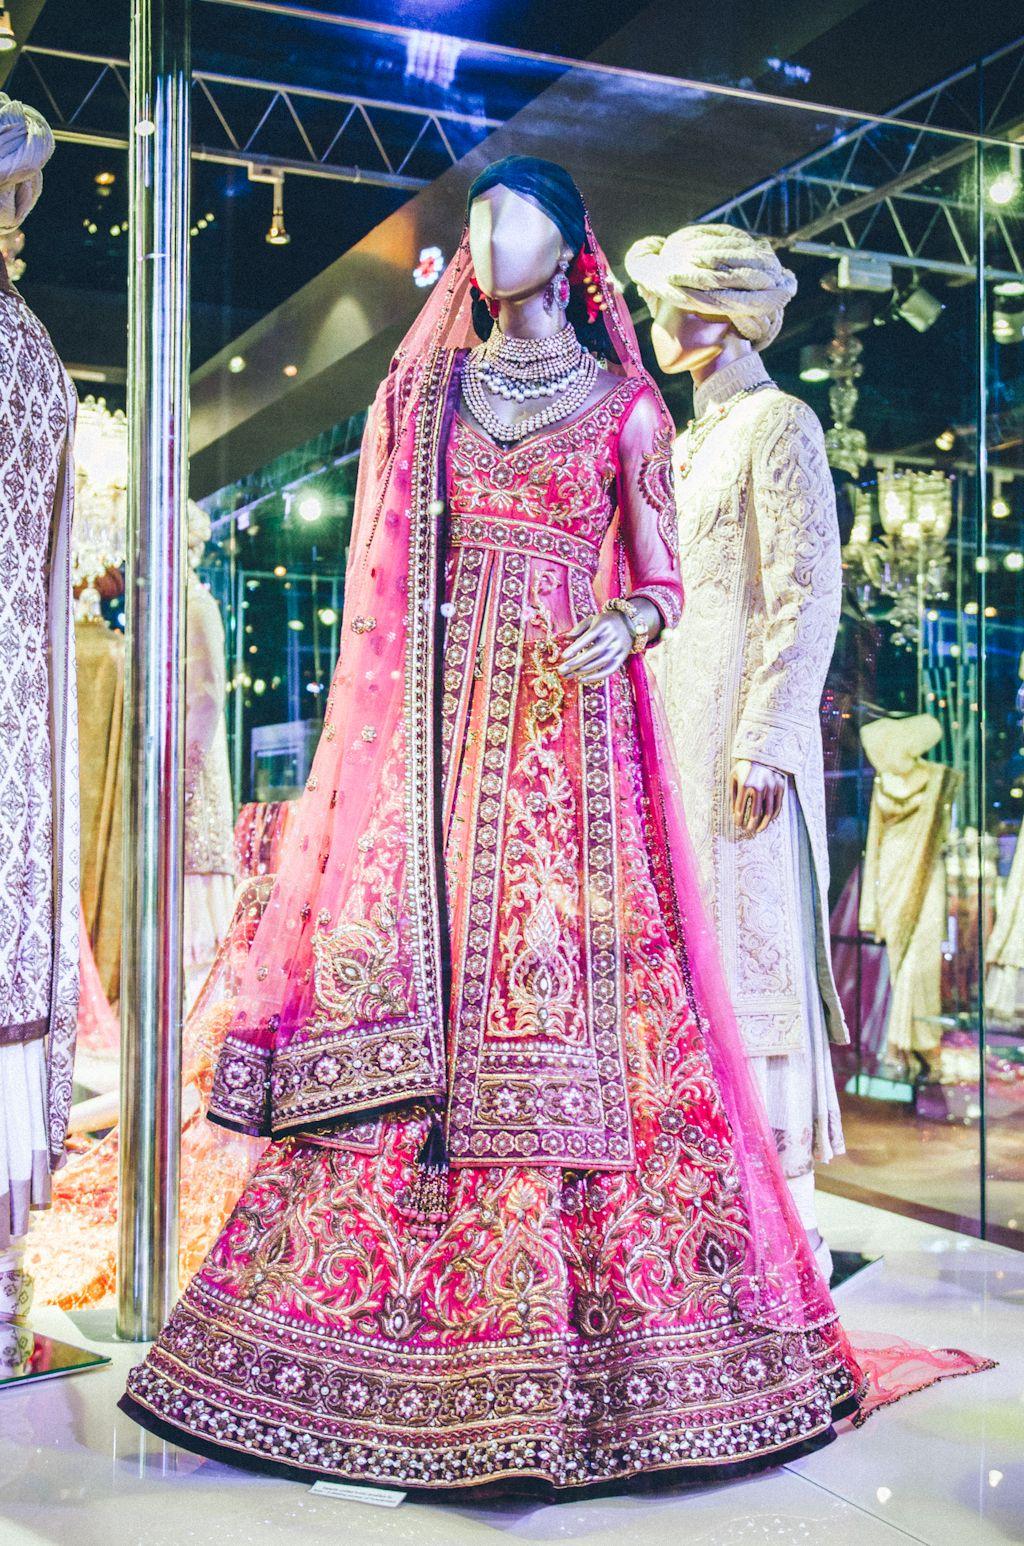 South asian wedding dresses  Indian wedding photographer  Photography by Naina  Tarun Tahiliani